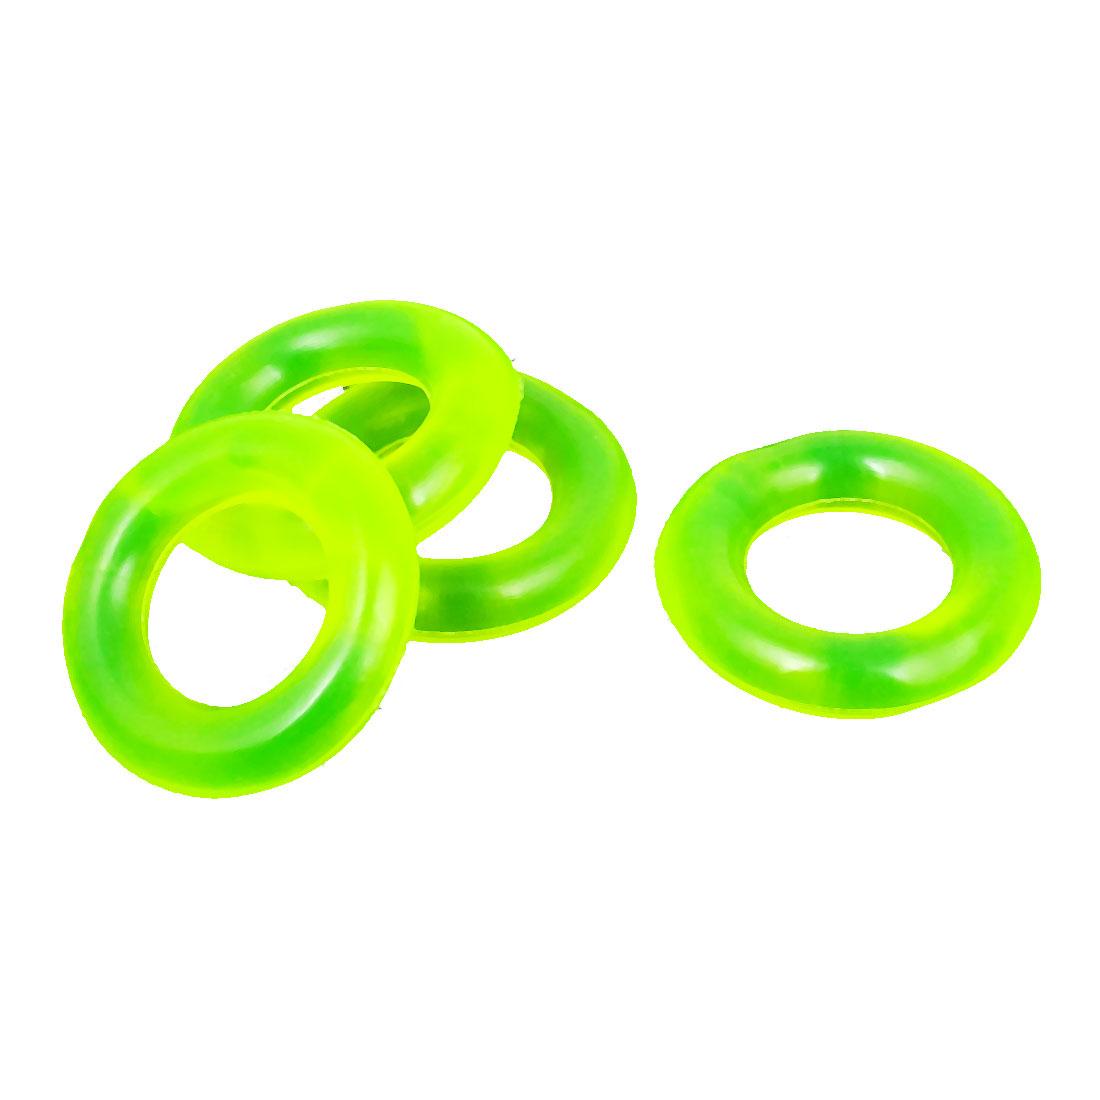 4pcs 35mm x 19mm x 13mm Green Rubber O Ring Washer Plumbing Oil Seal Sealing Gasket